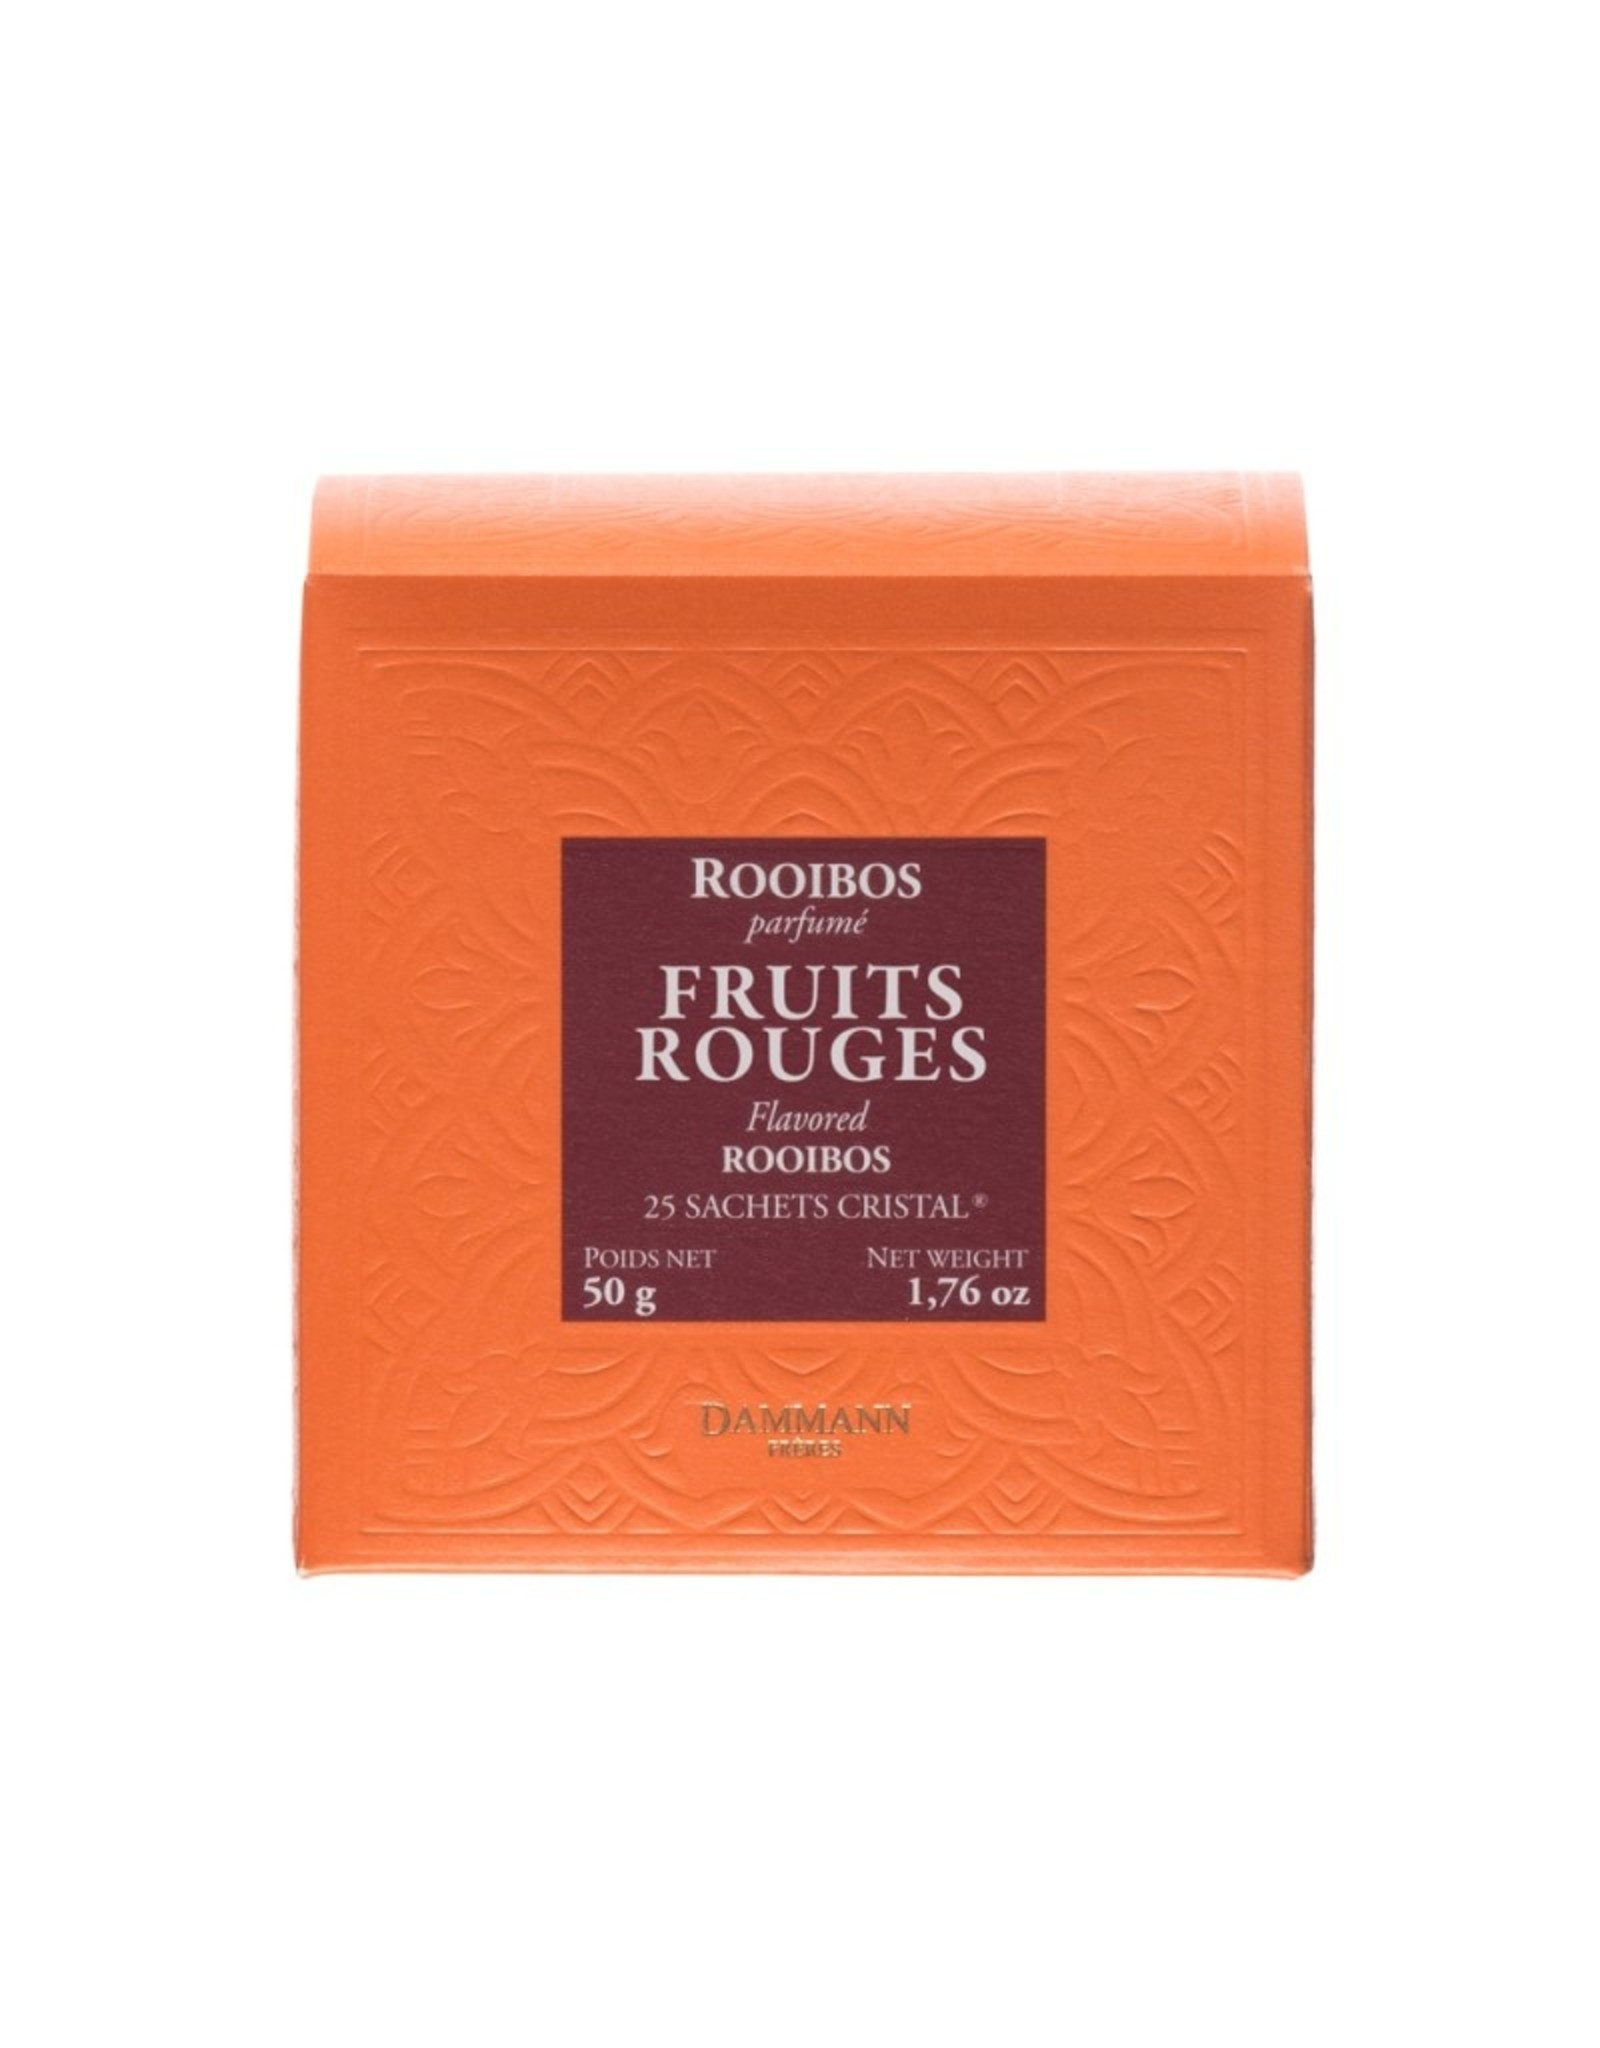 Dammann 'Fruits Rouges' Rooibos